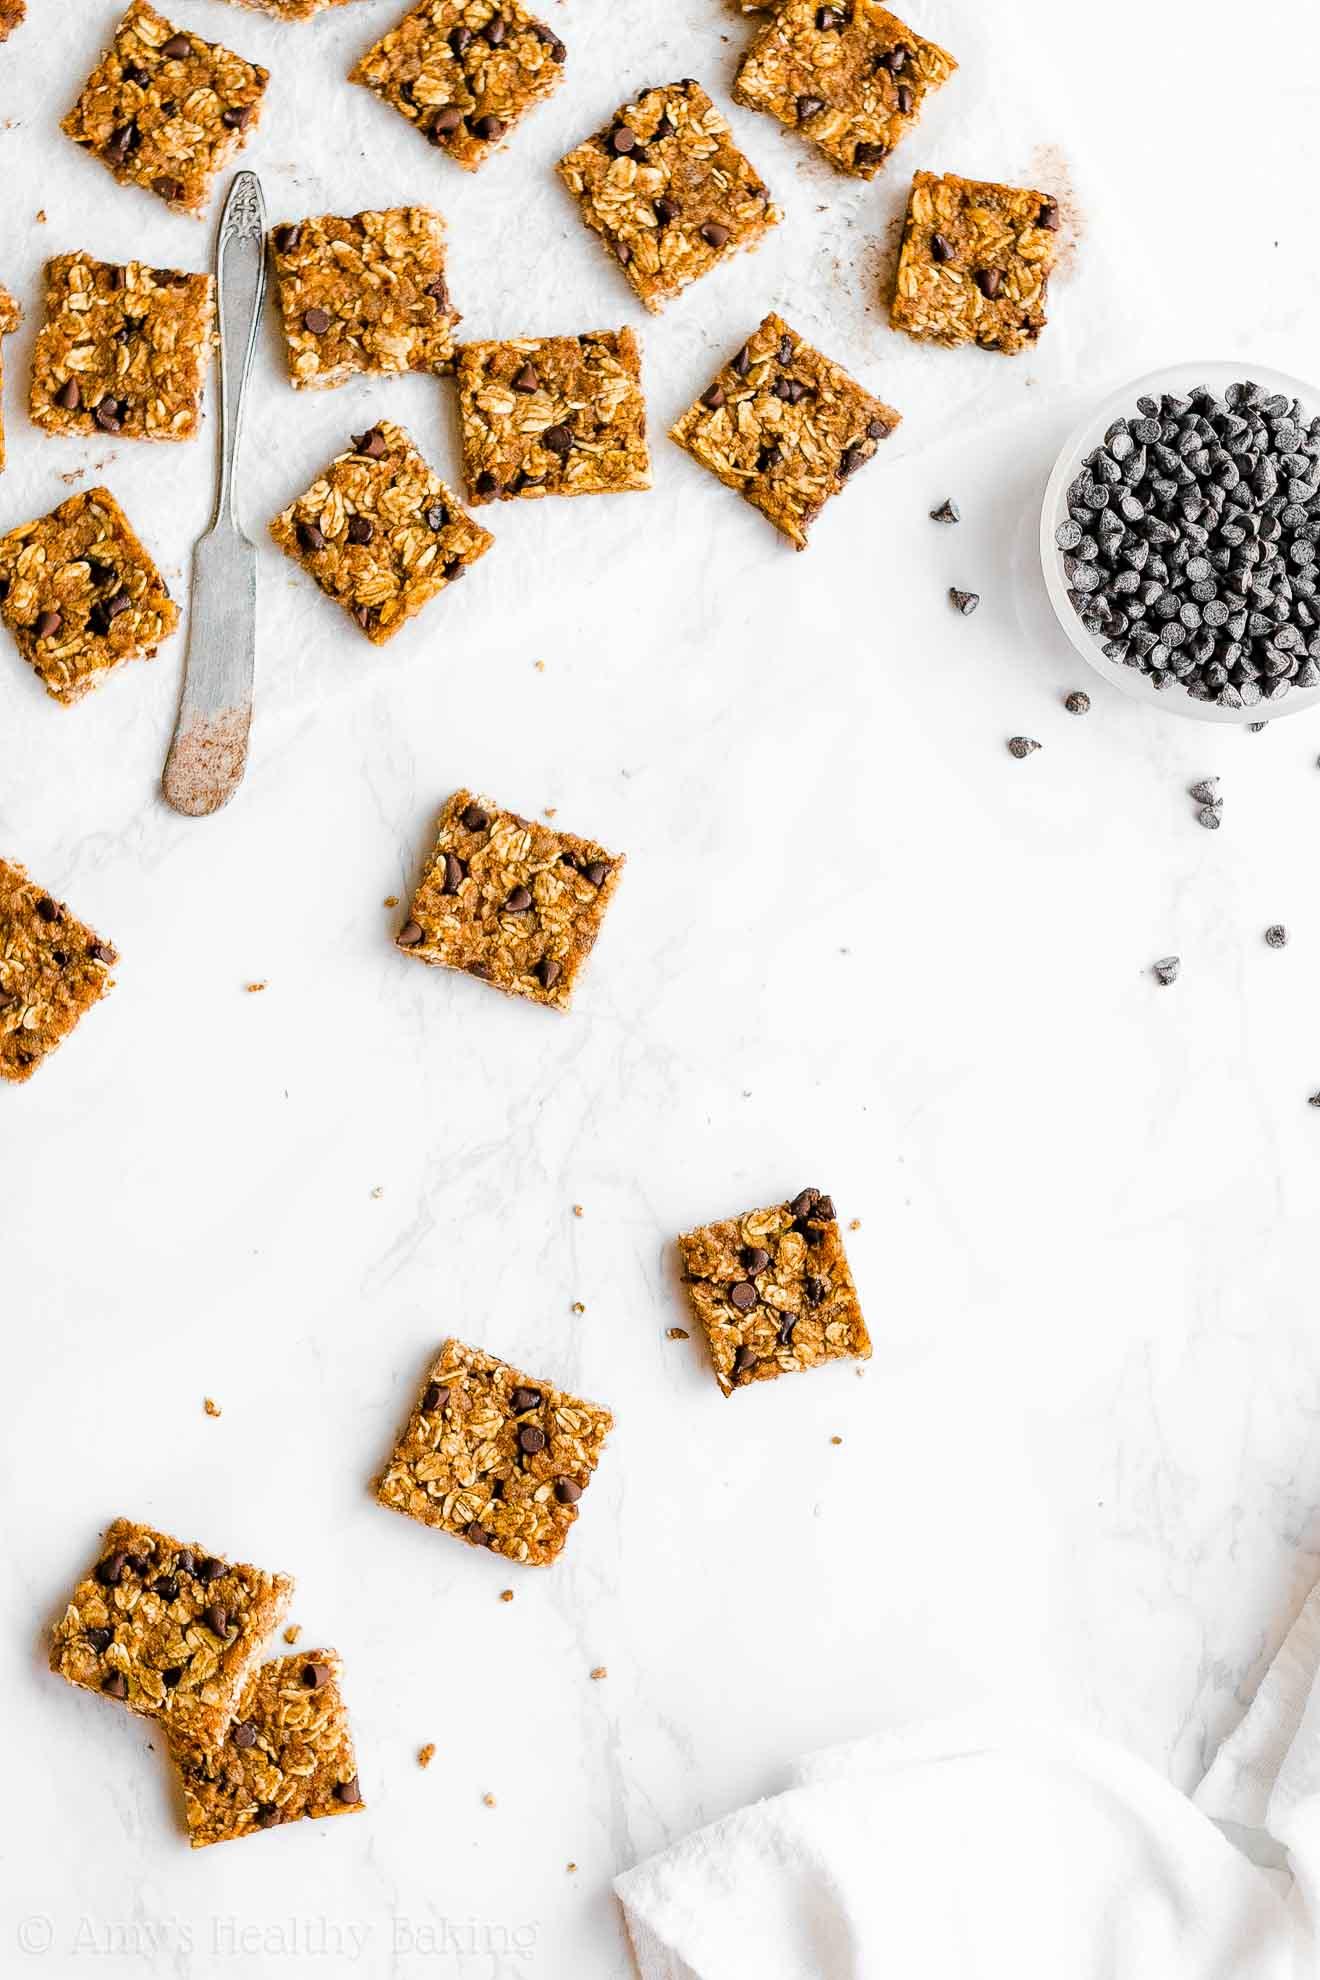 Healthy Pumpkin Chocolate Chip Granola Bar Bites with Weight Watchers Points